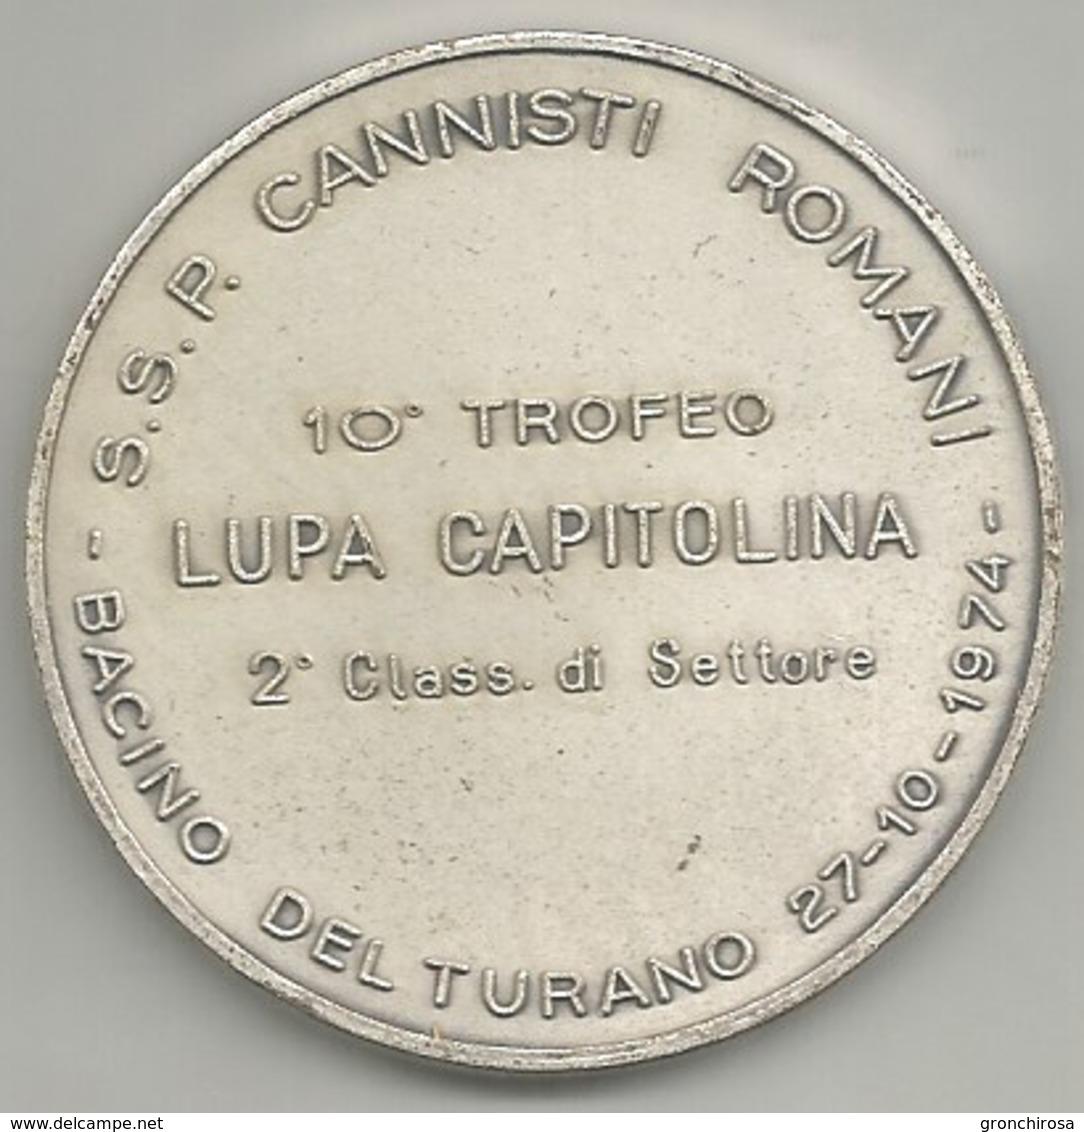 Pesca Sportiva 1974 Bacino Del Turano, 10° Trofeo Lupa Capitolina, Mist. Ag. Gr. 48, Cm. 5. - Italia